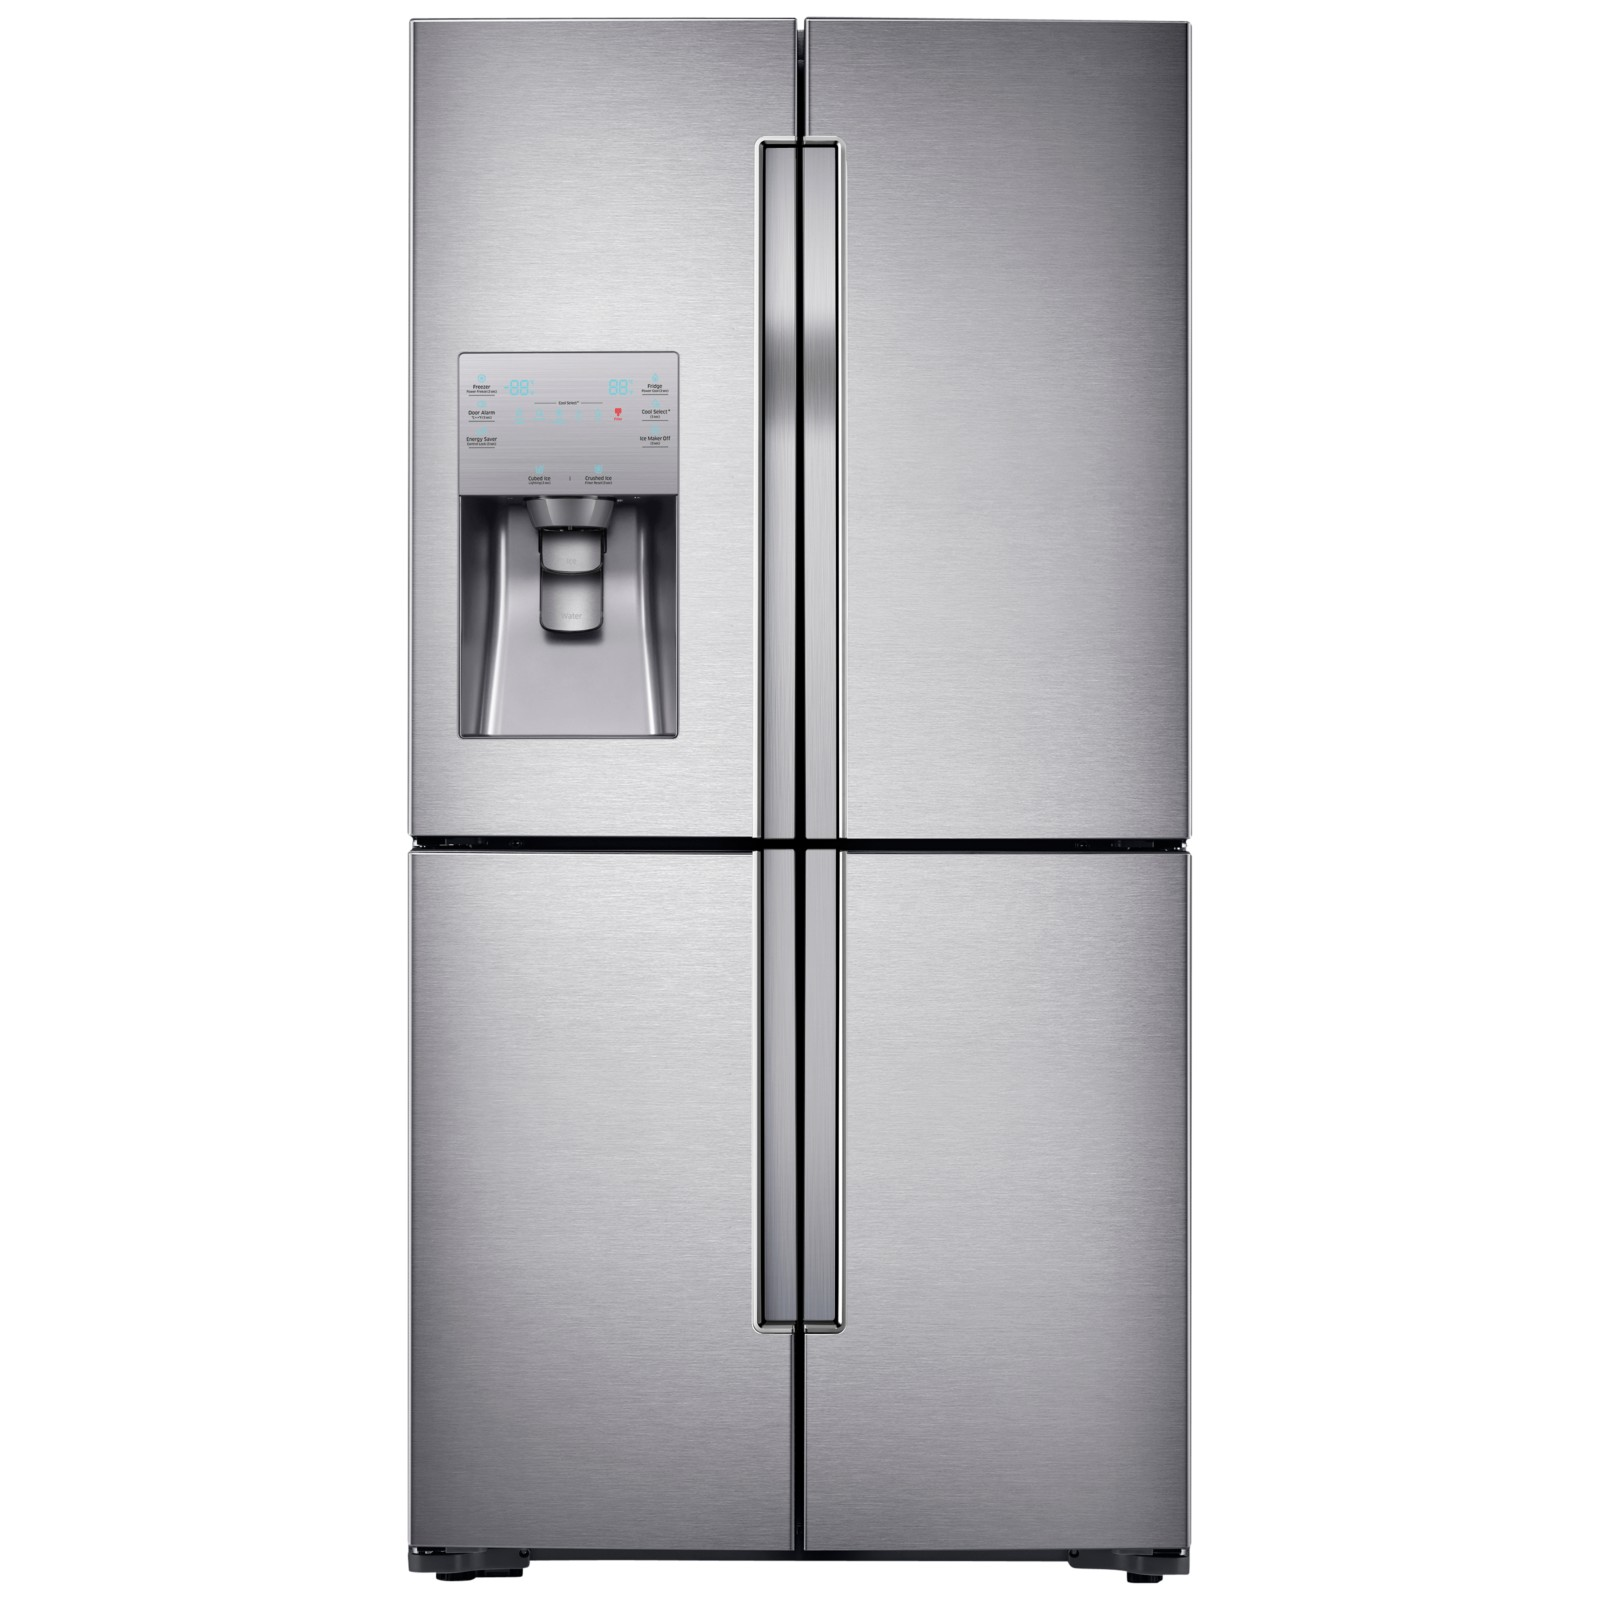 Samsung RF56J9040SR 4-Door American Style Fridge Freezer